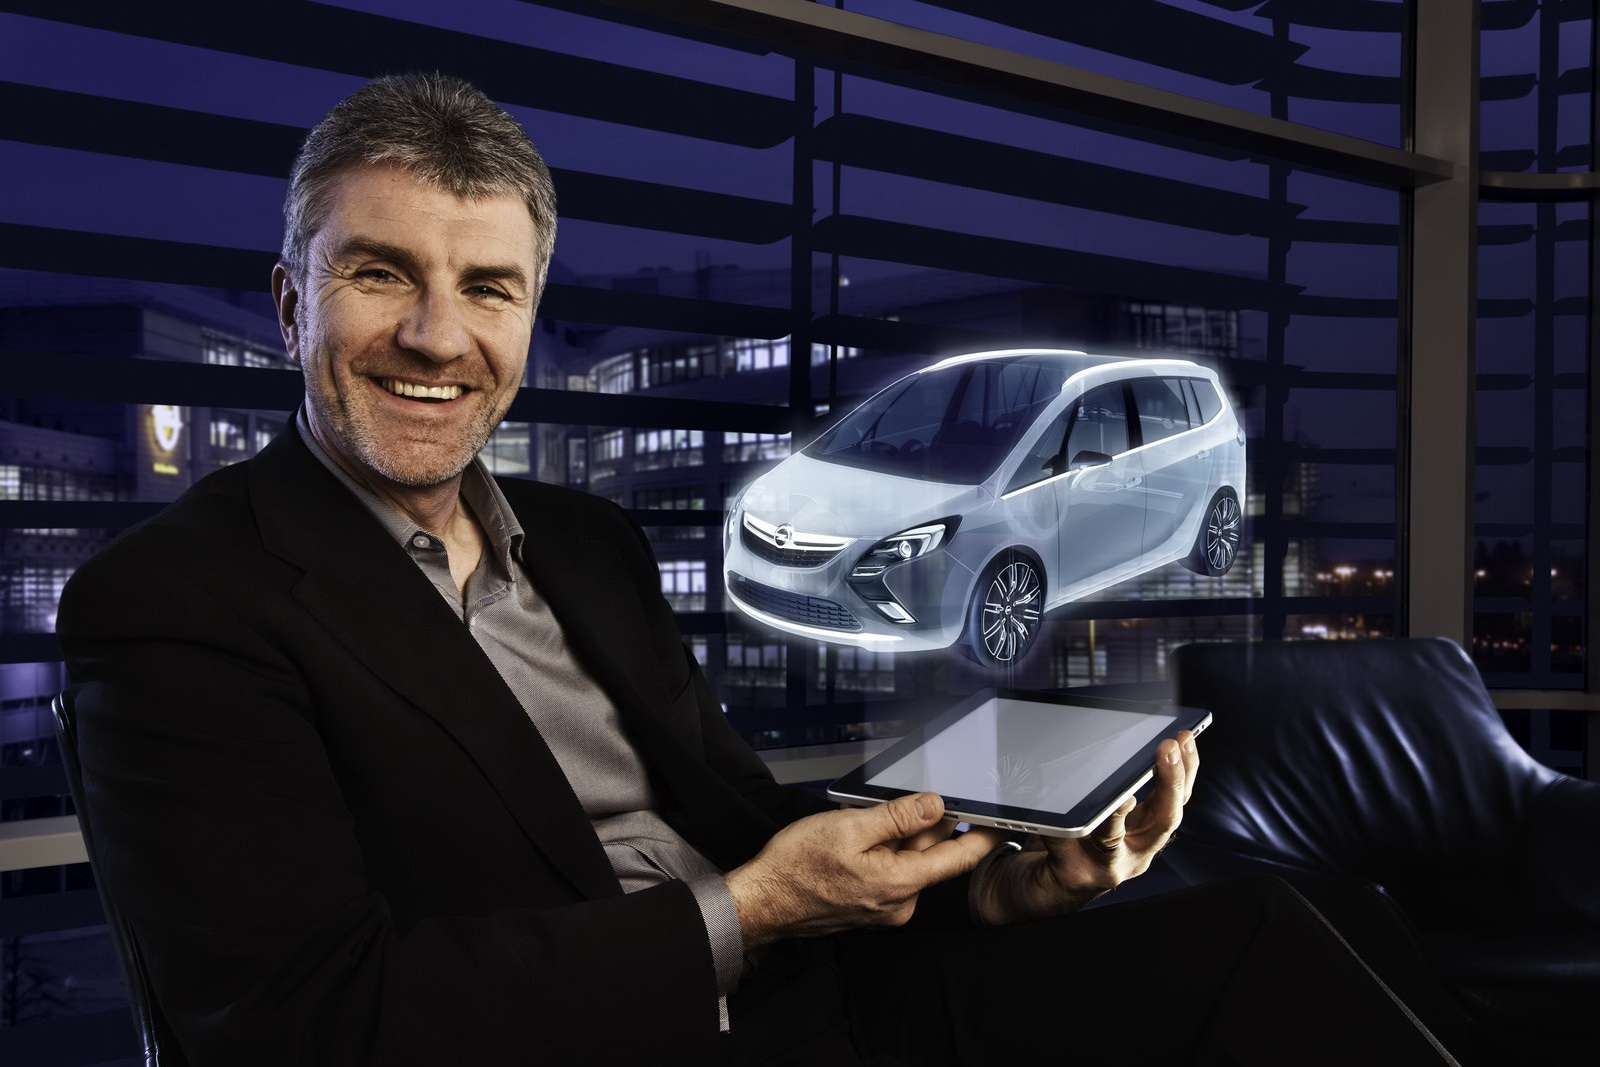 Opel Zafira carscoop luty 2011